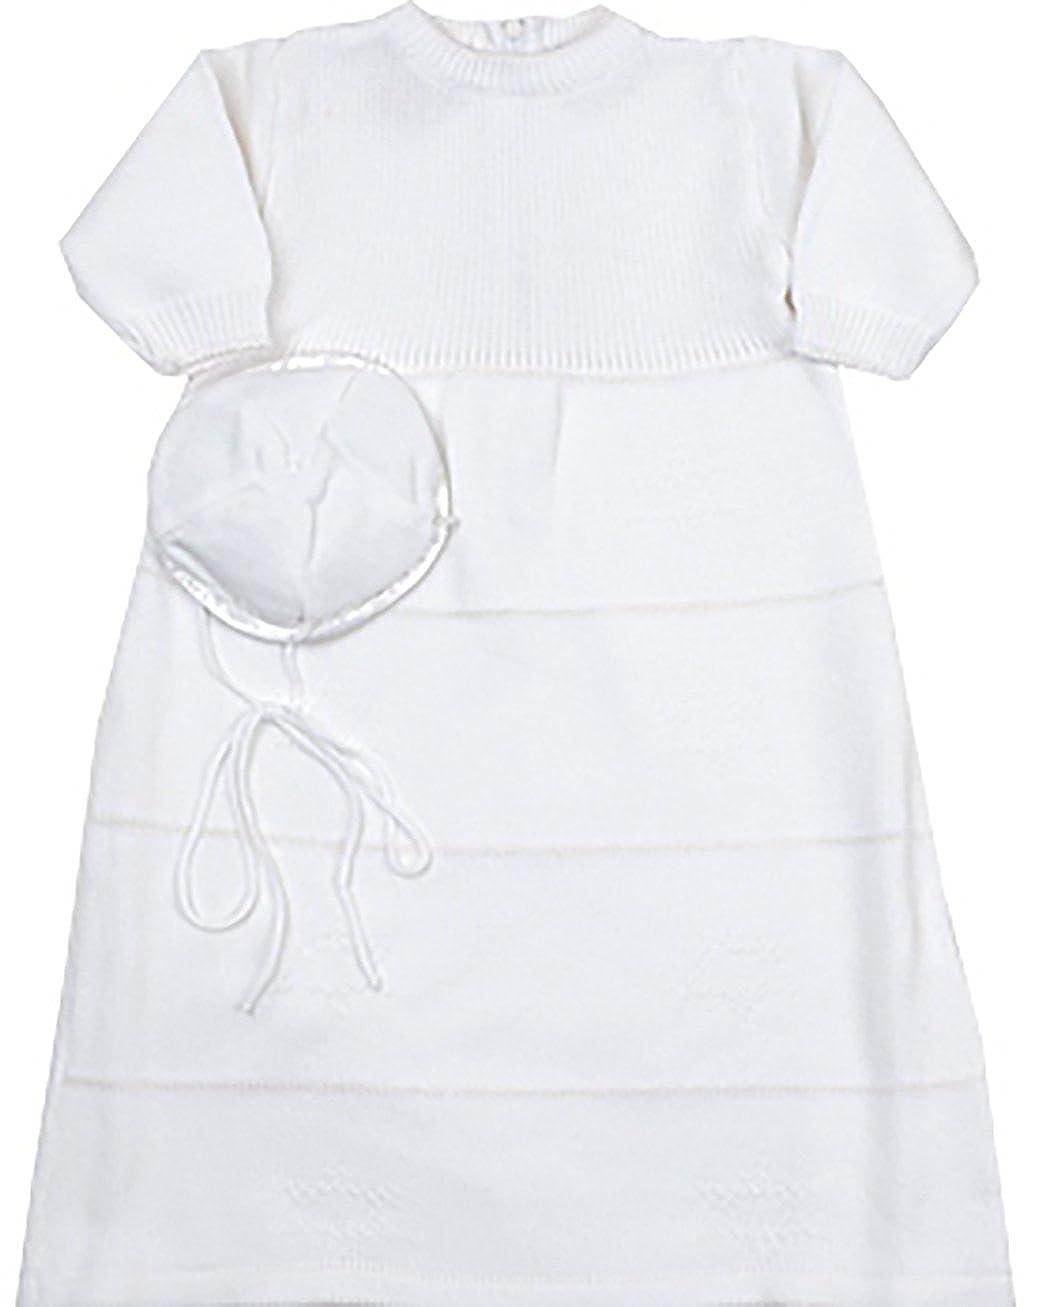 Amazon.com: Baby Boy\'s Circumcision / Bris / Brit Gown with Star of ...